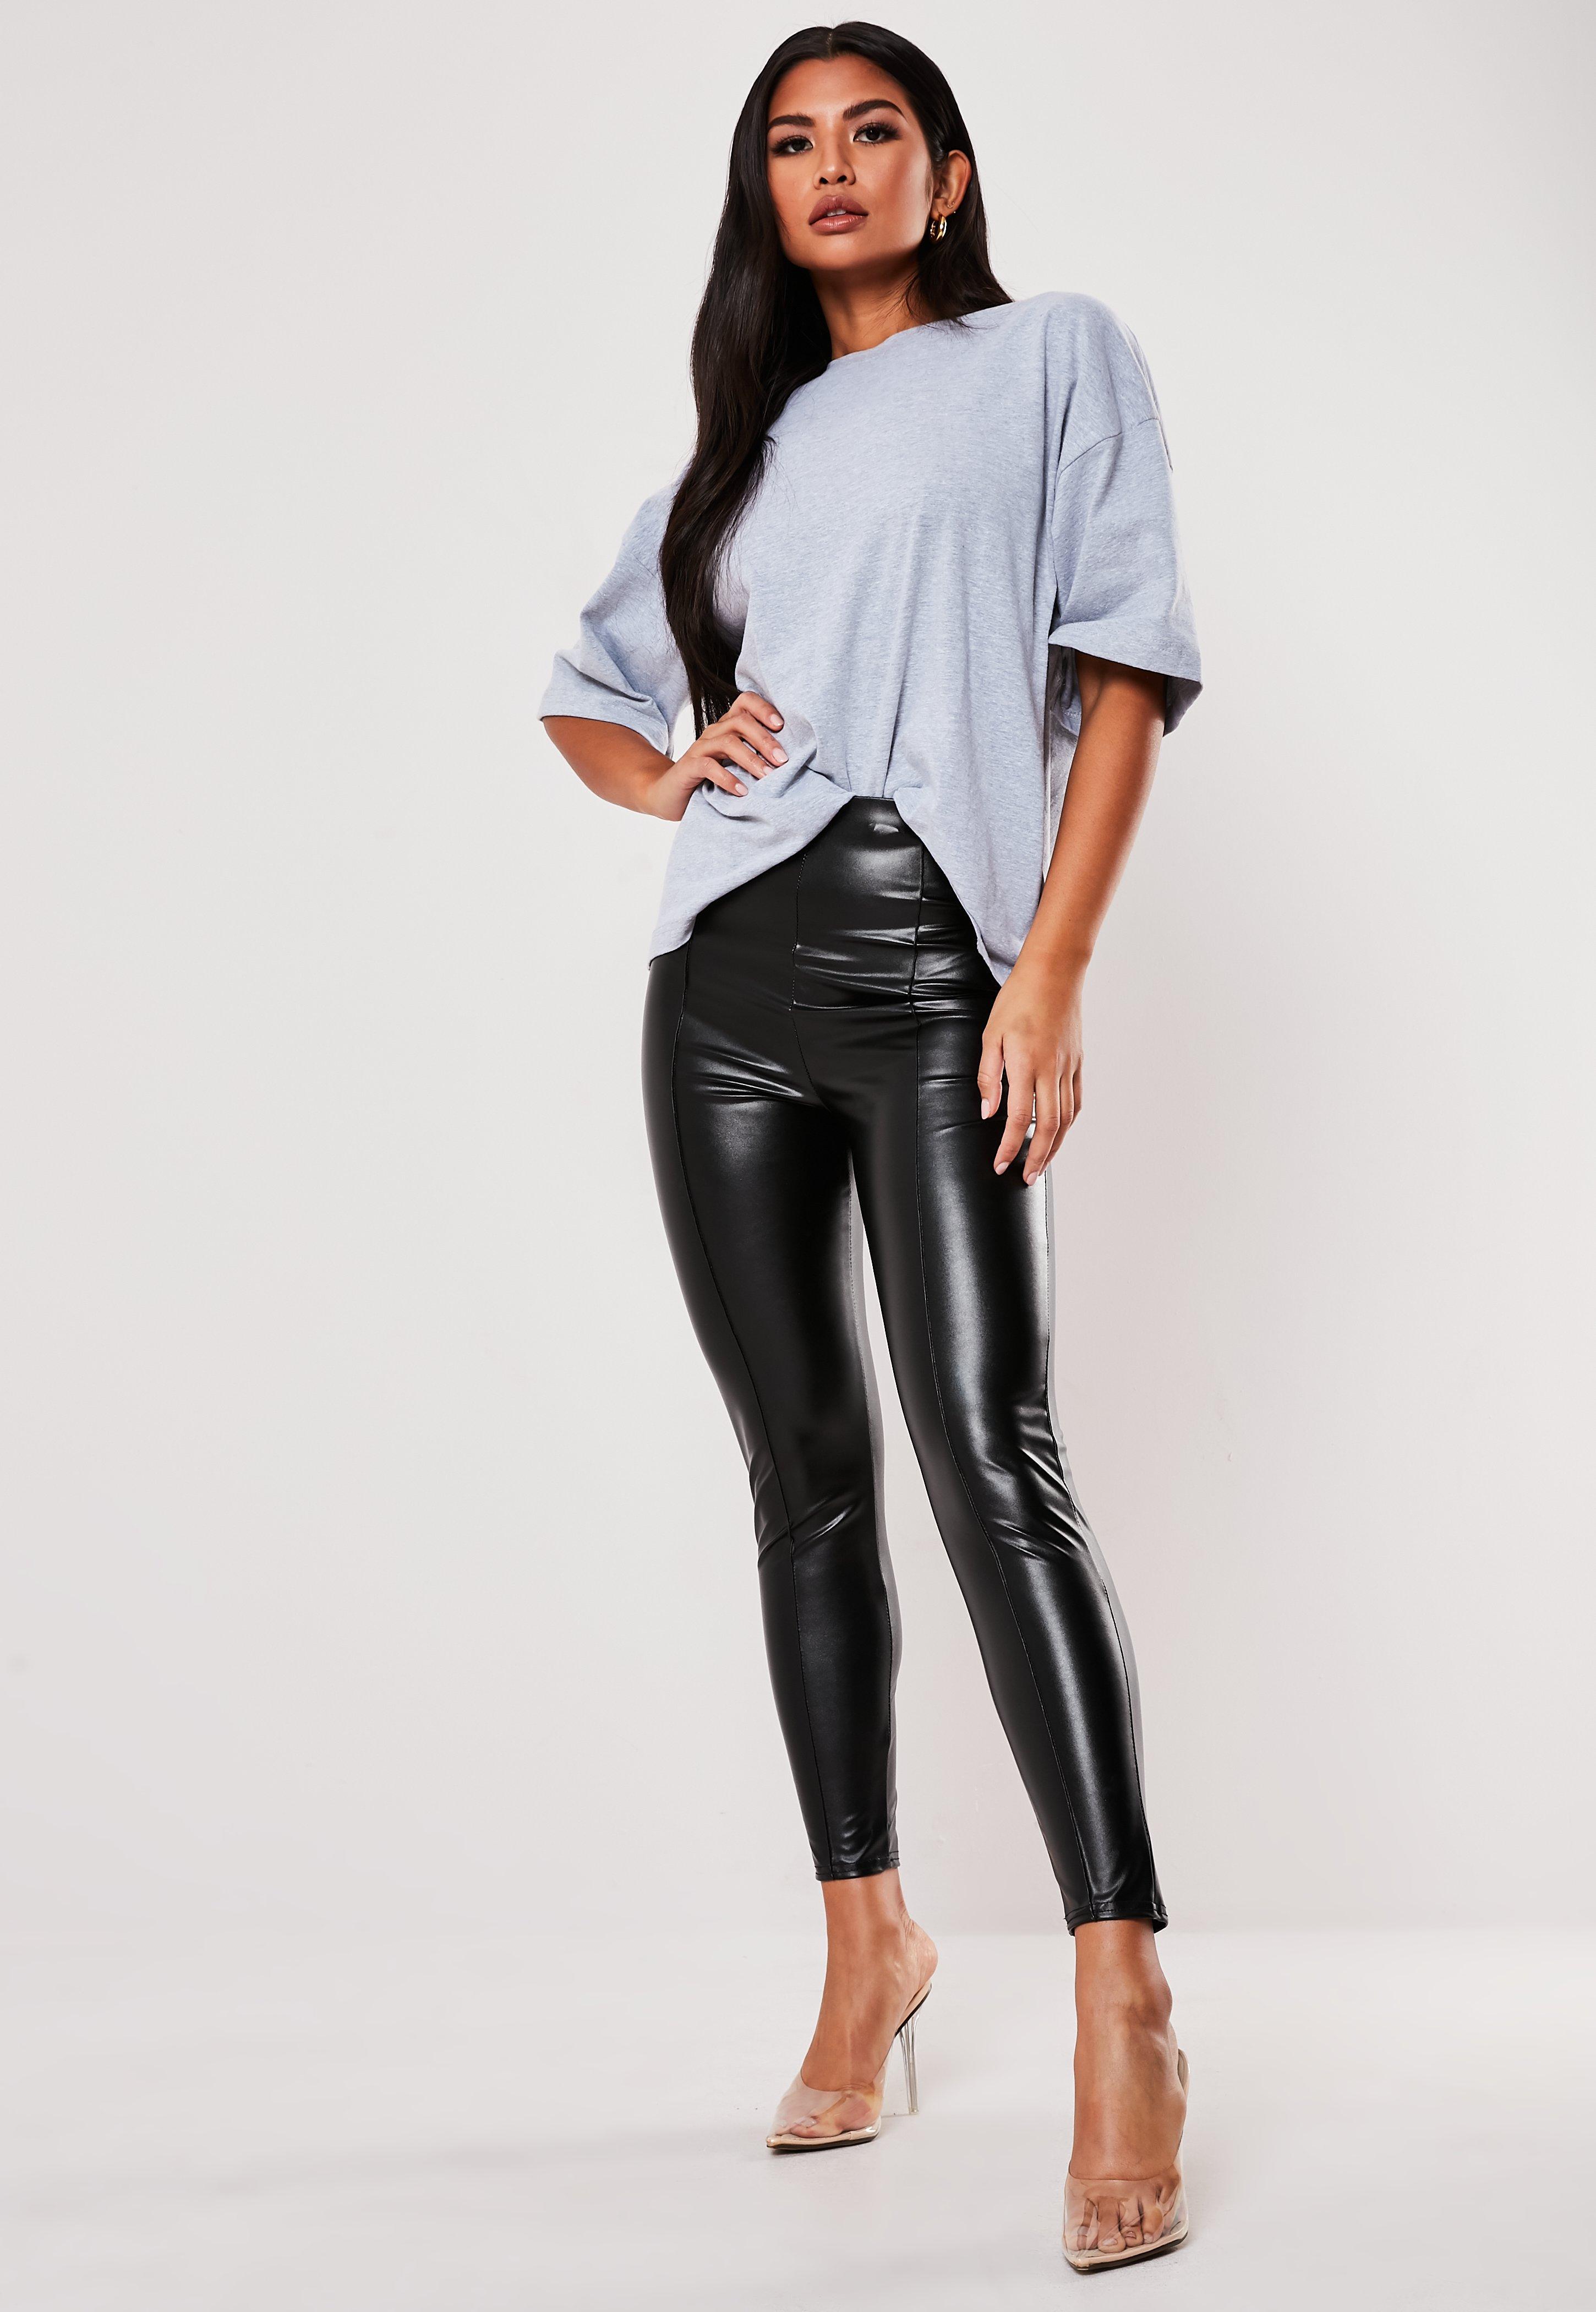 Black Faux Leather Pin Tuck Leggings